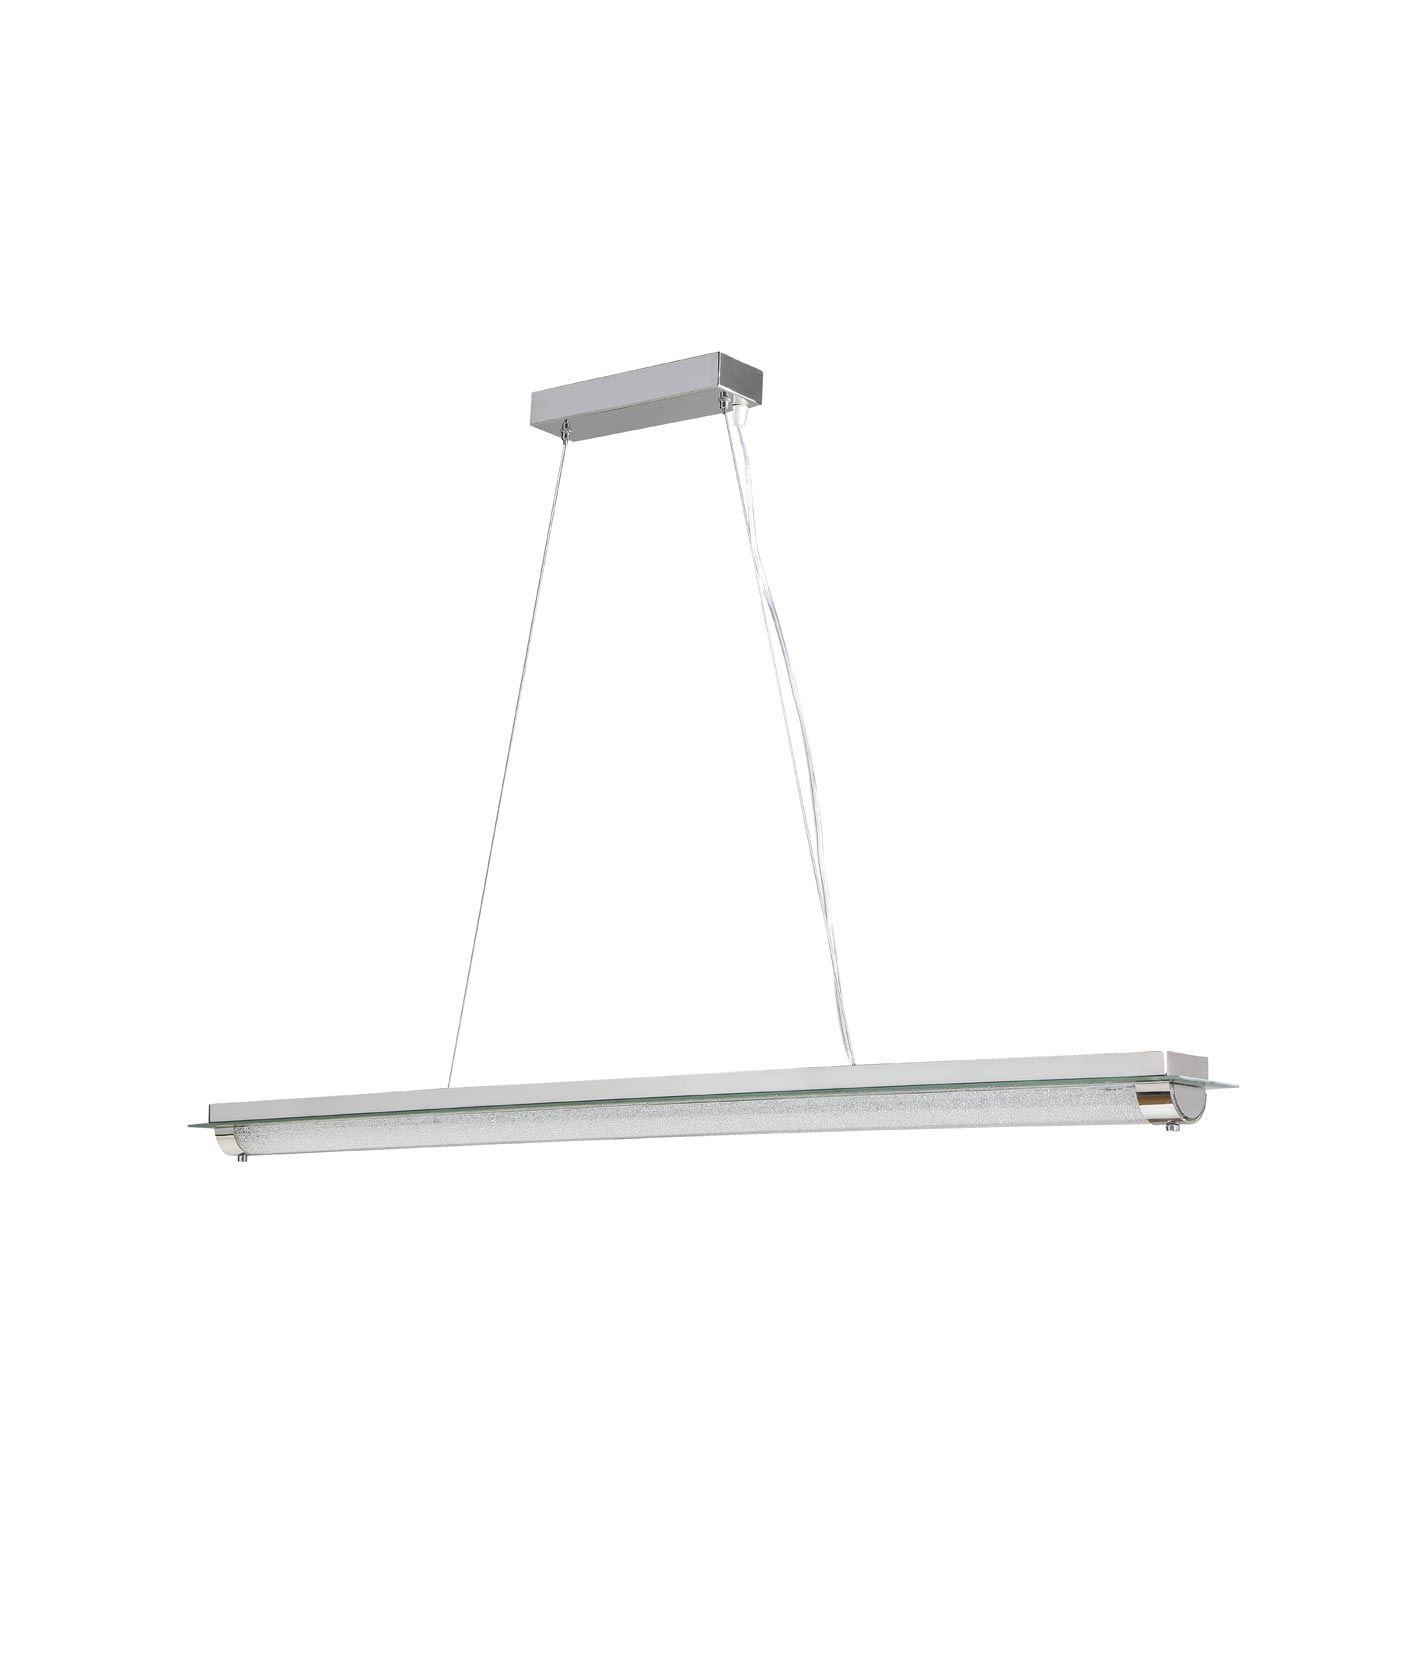 Lámpara colgante LED grande TUBE cromo cristal